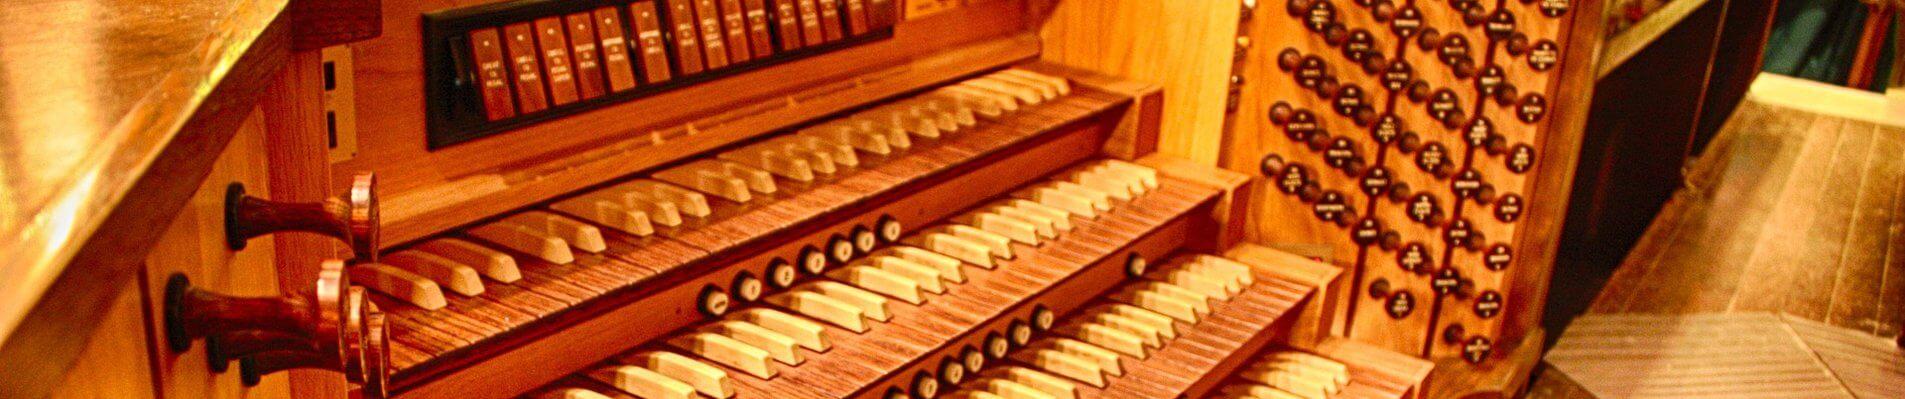 orgue montpon